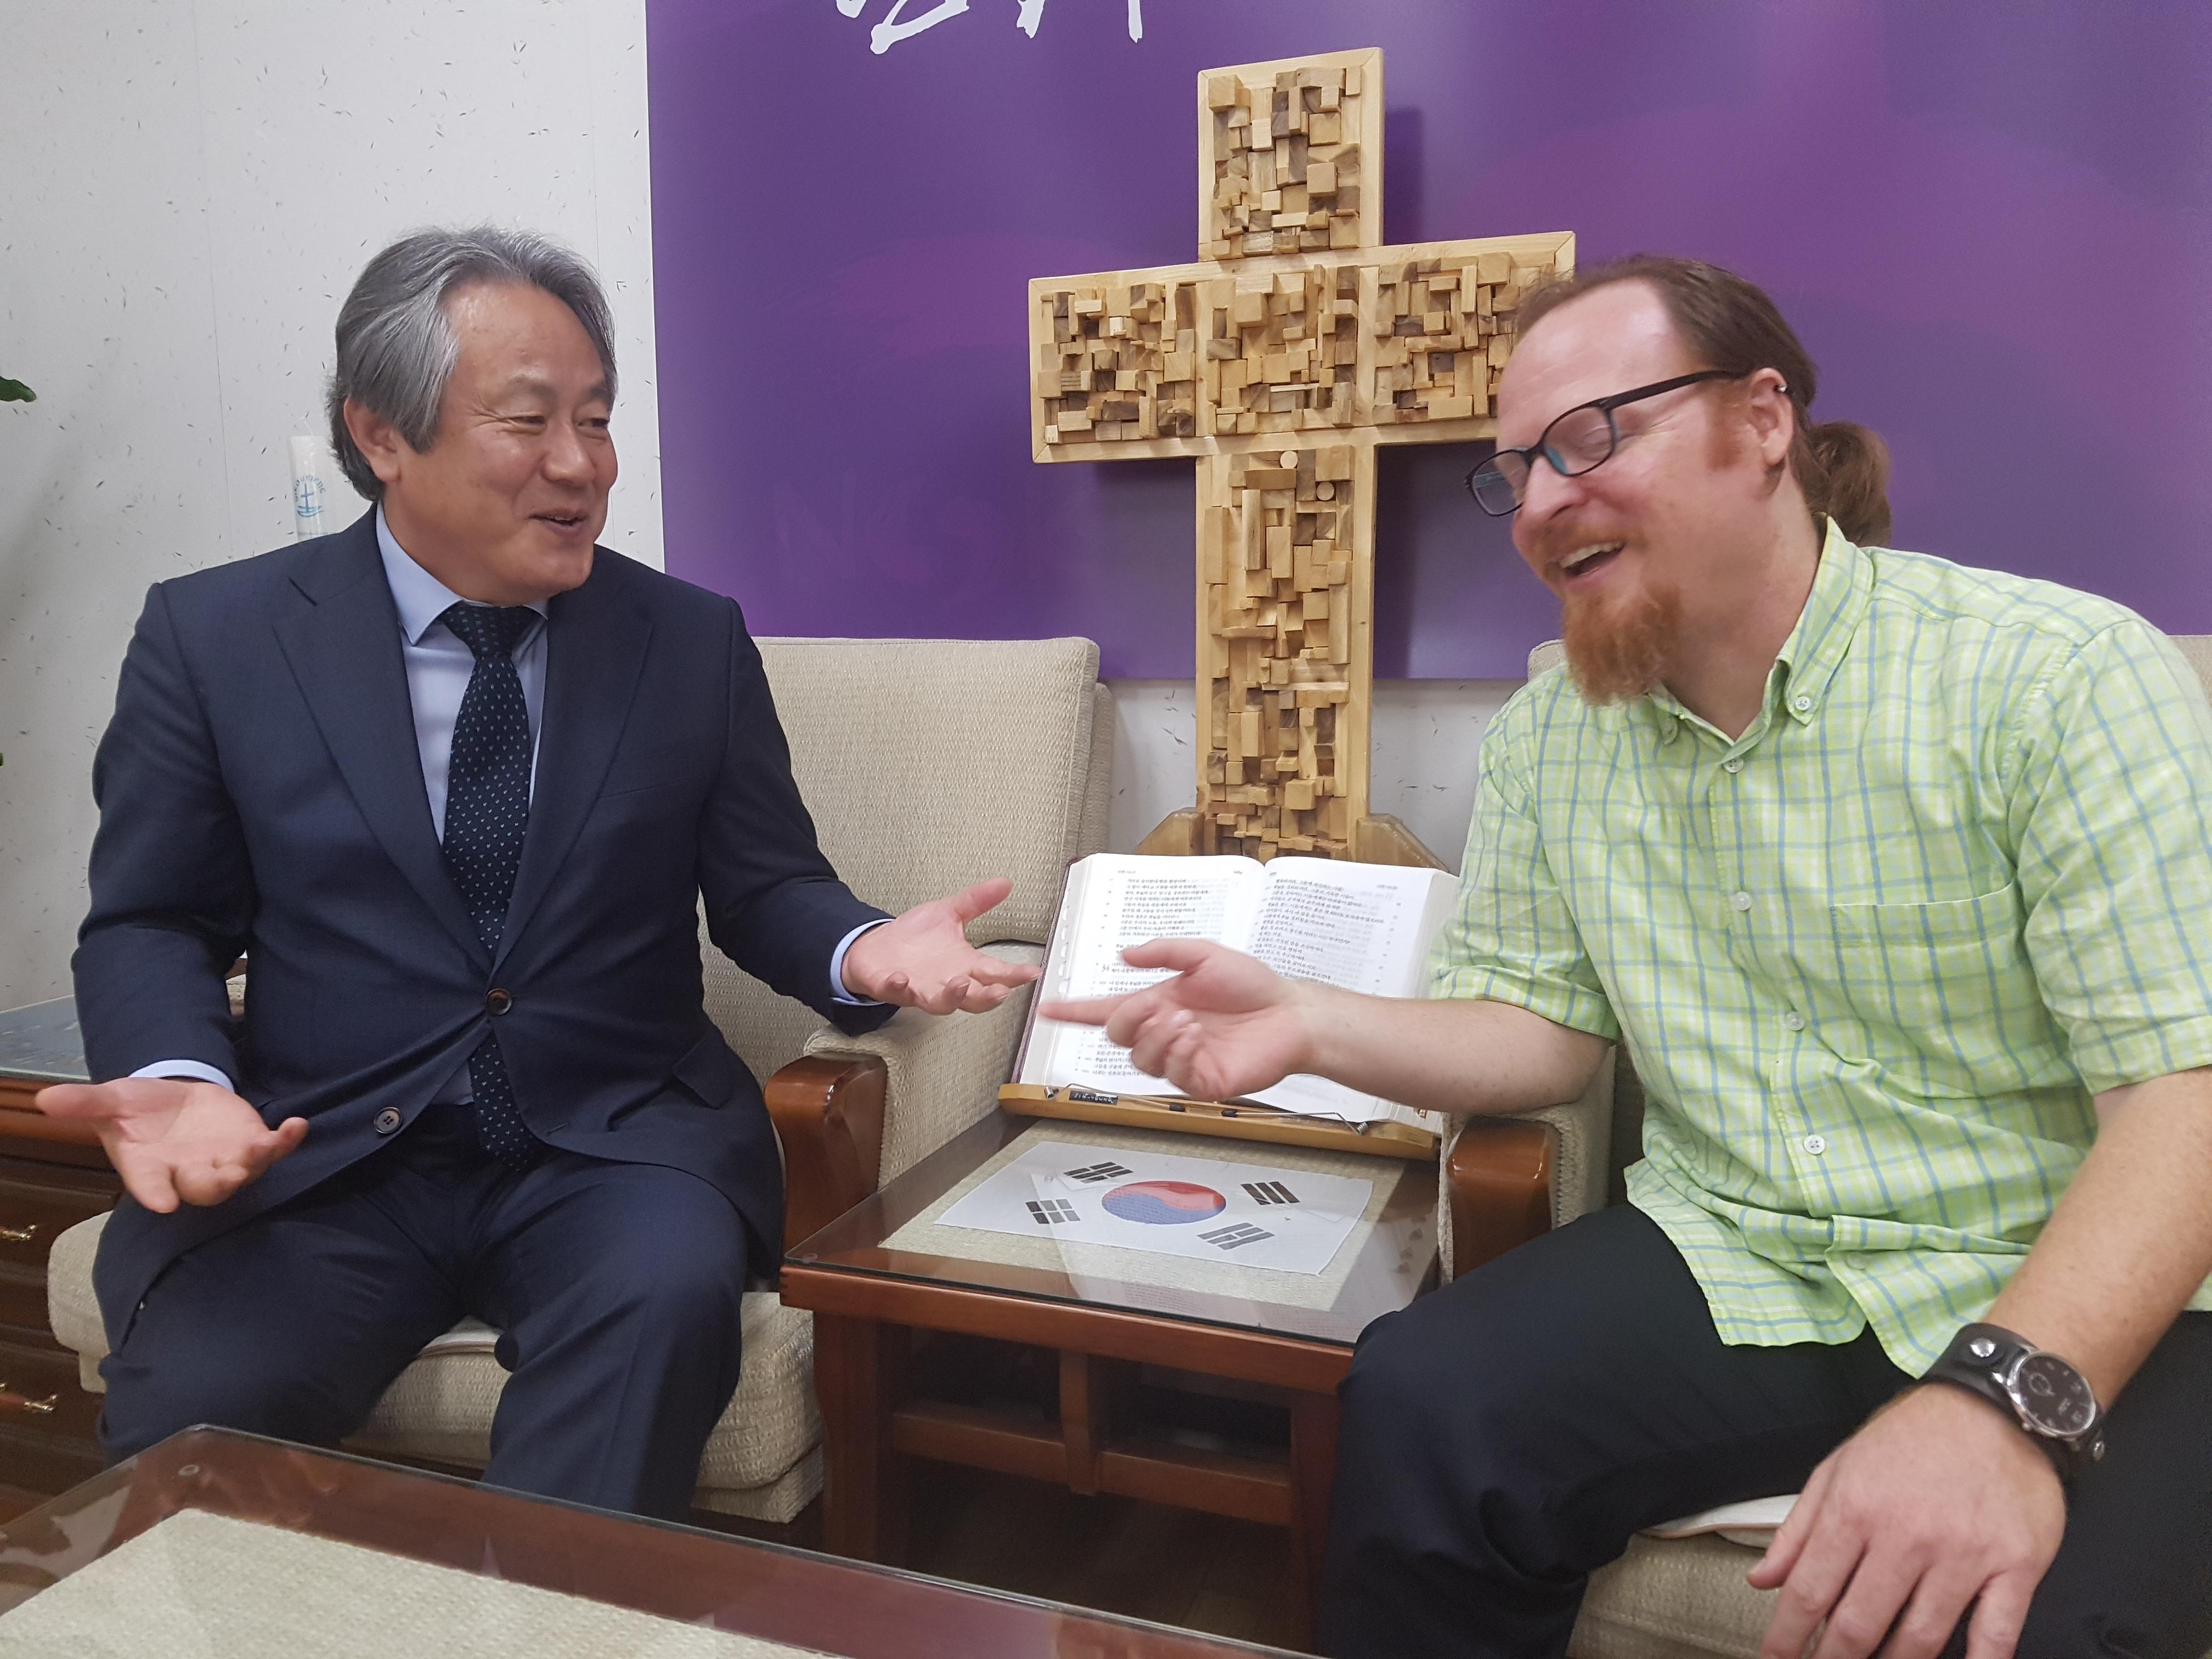 Rev. Lee Hong-jung shares stories of this visit to Pyongyang with Kurt.